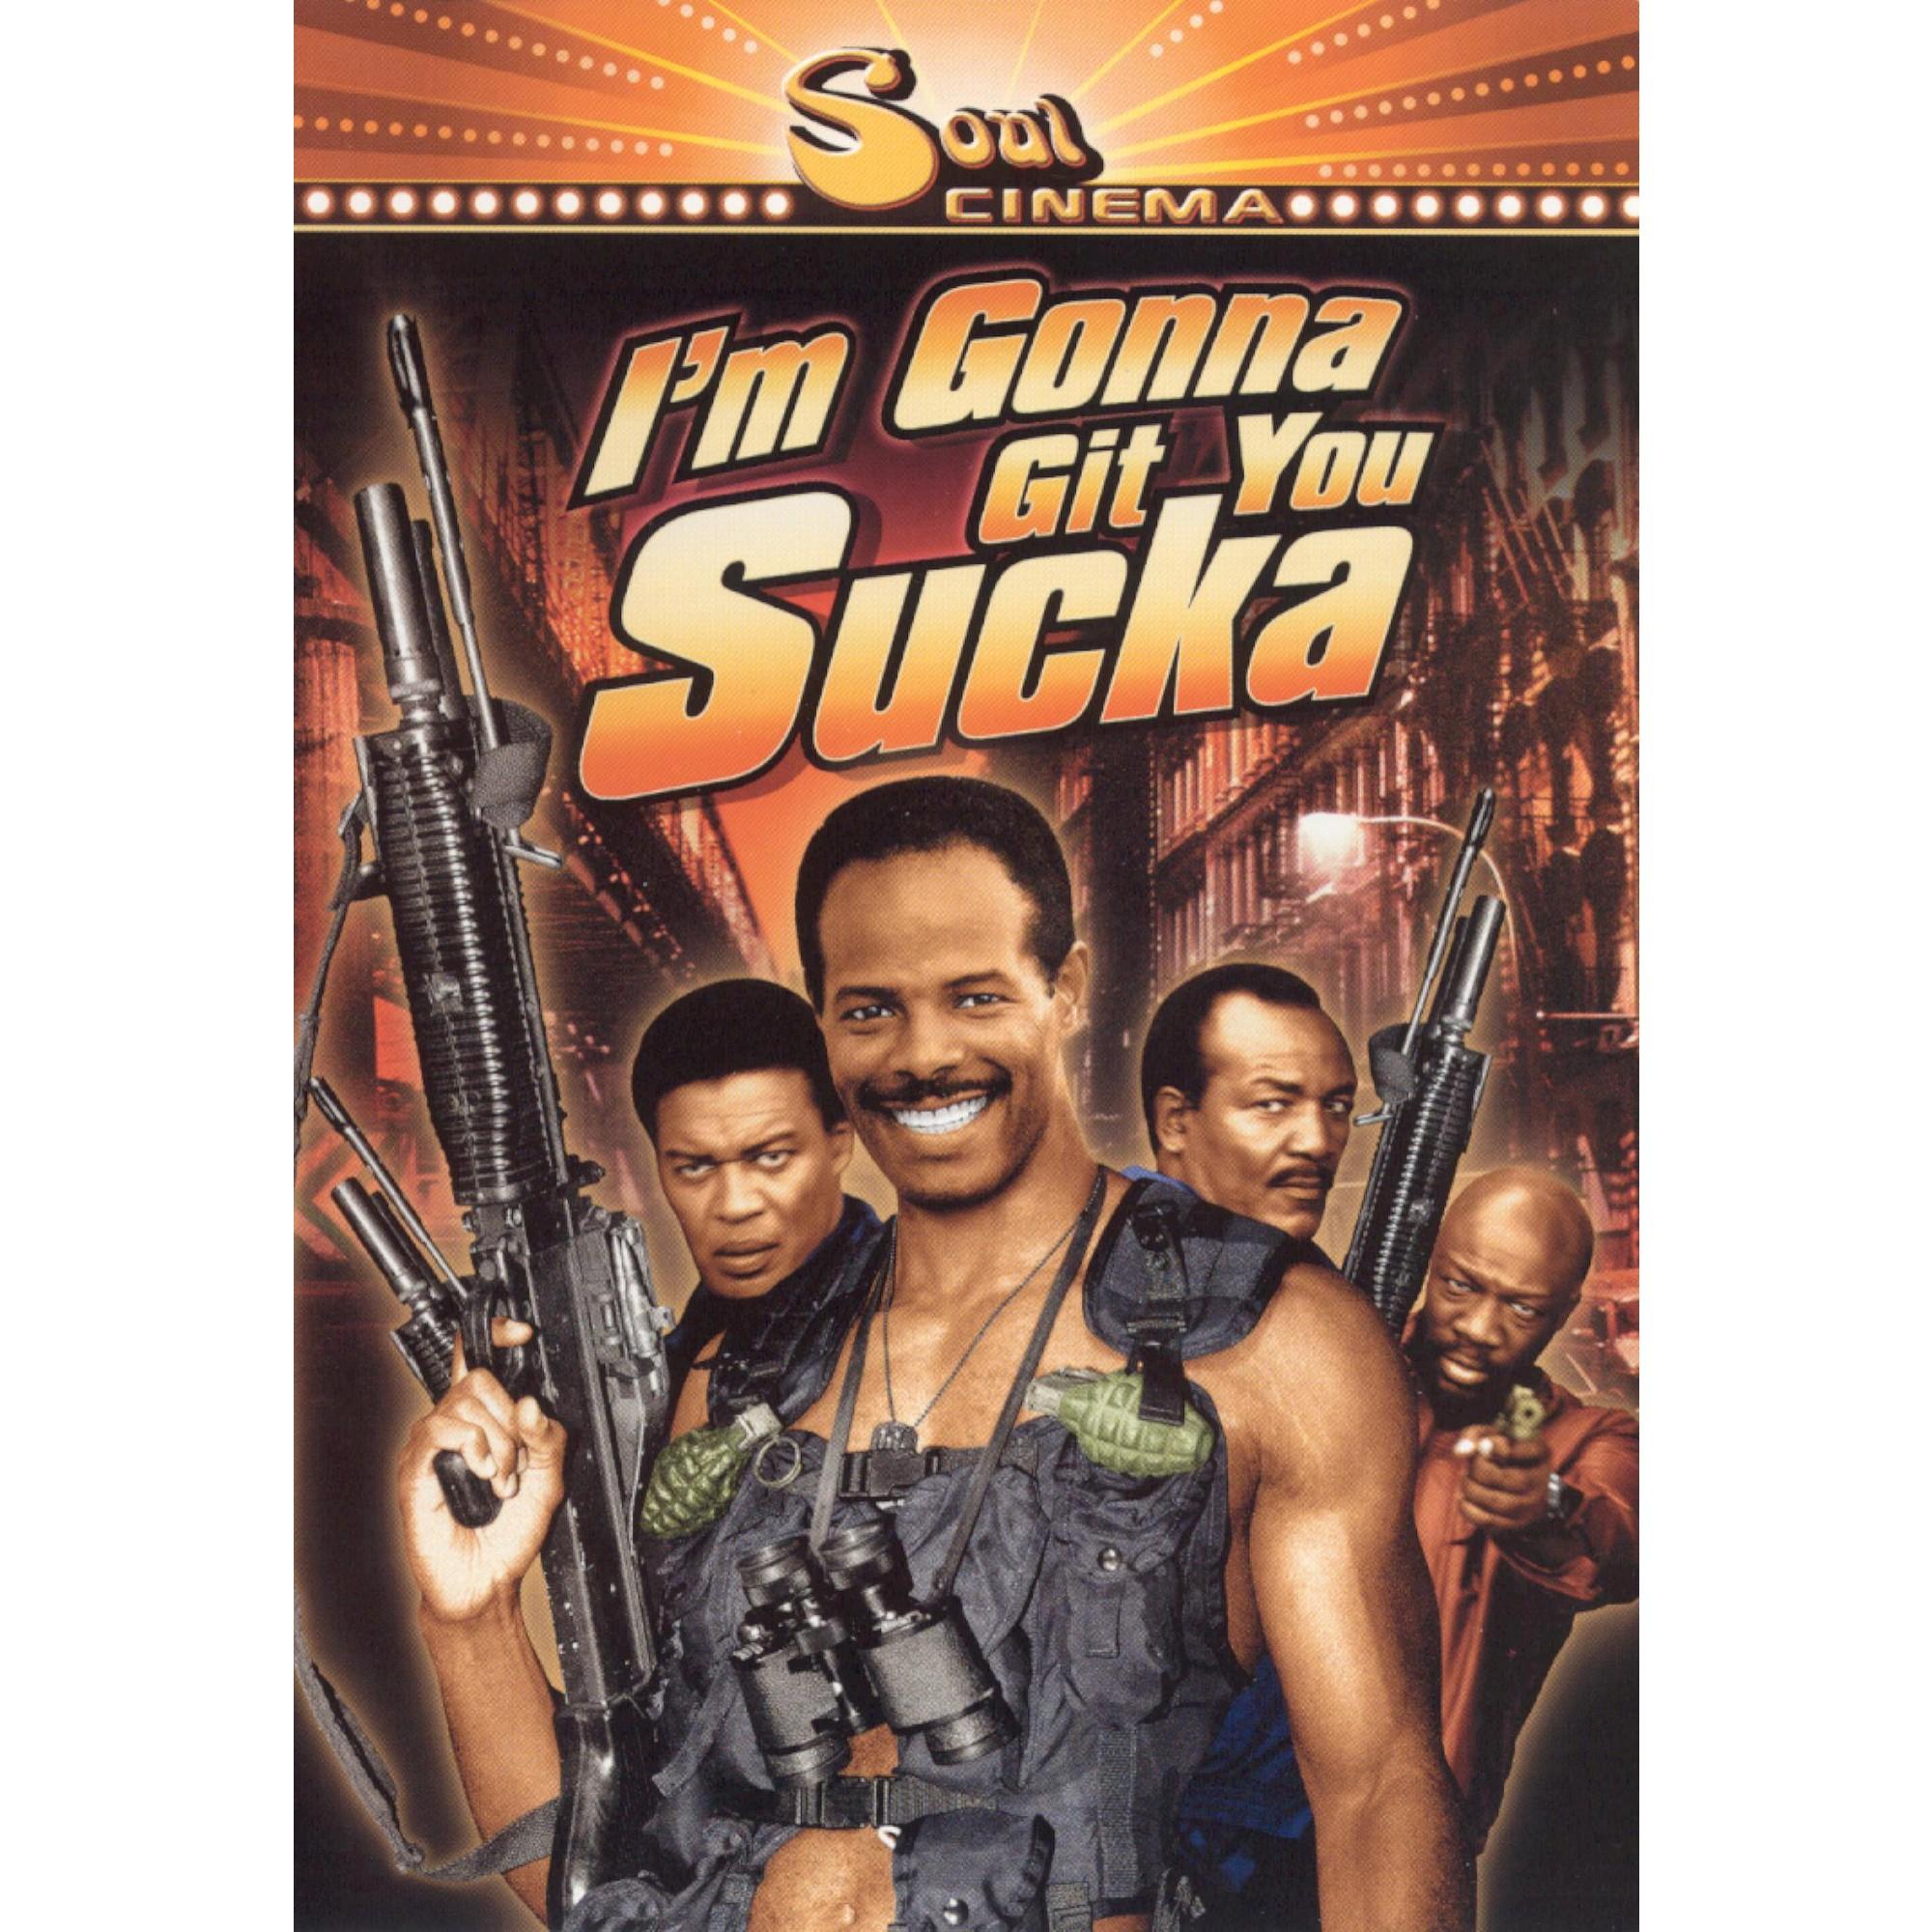 I'm gonna git you sucka (Dvd) Blaxploitation film